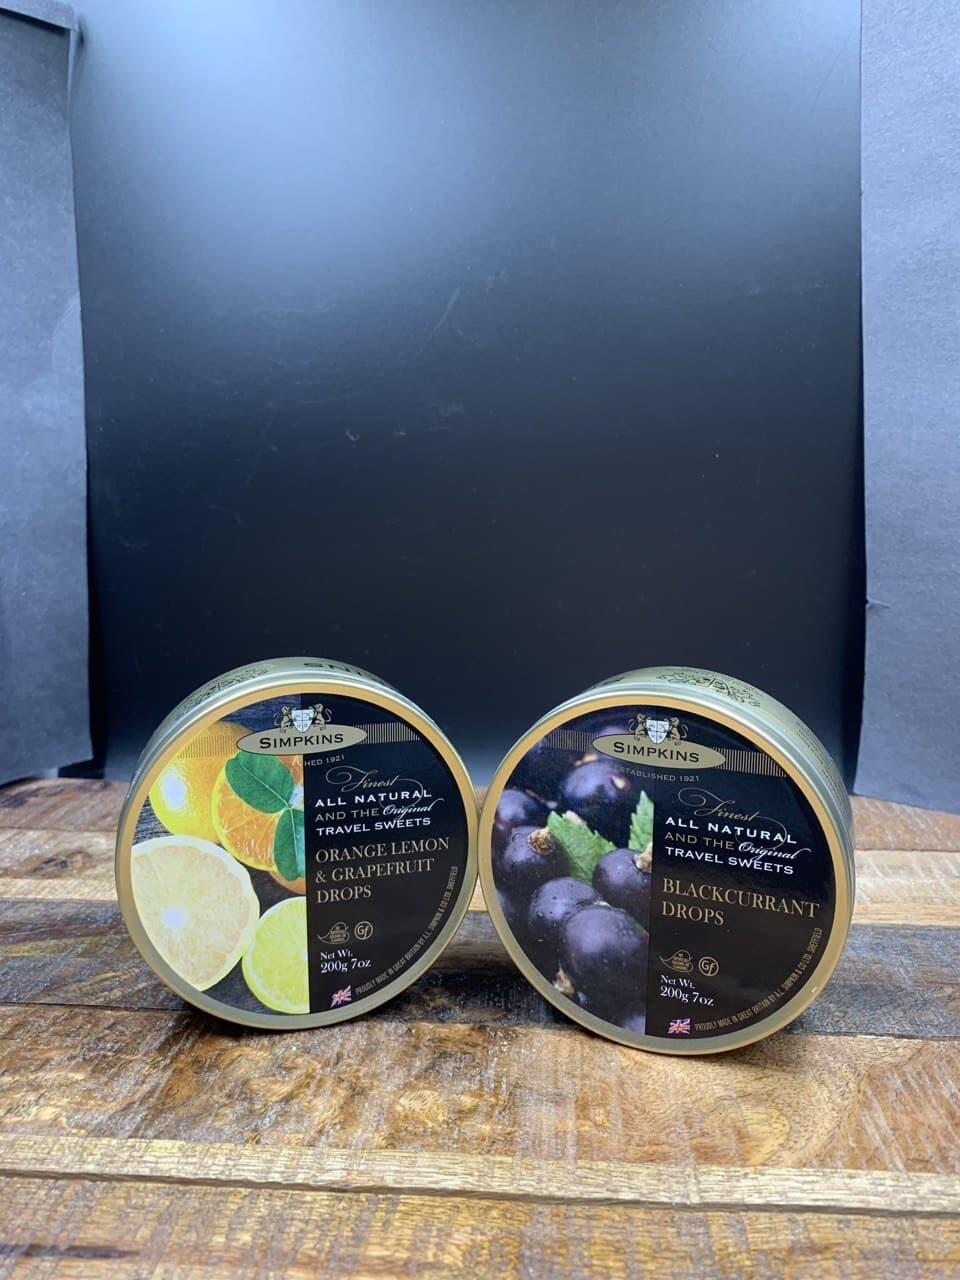 Simpkins Orange Lemon & Grapefruit Drops 200g